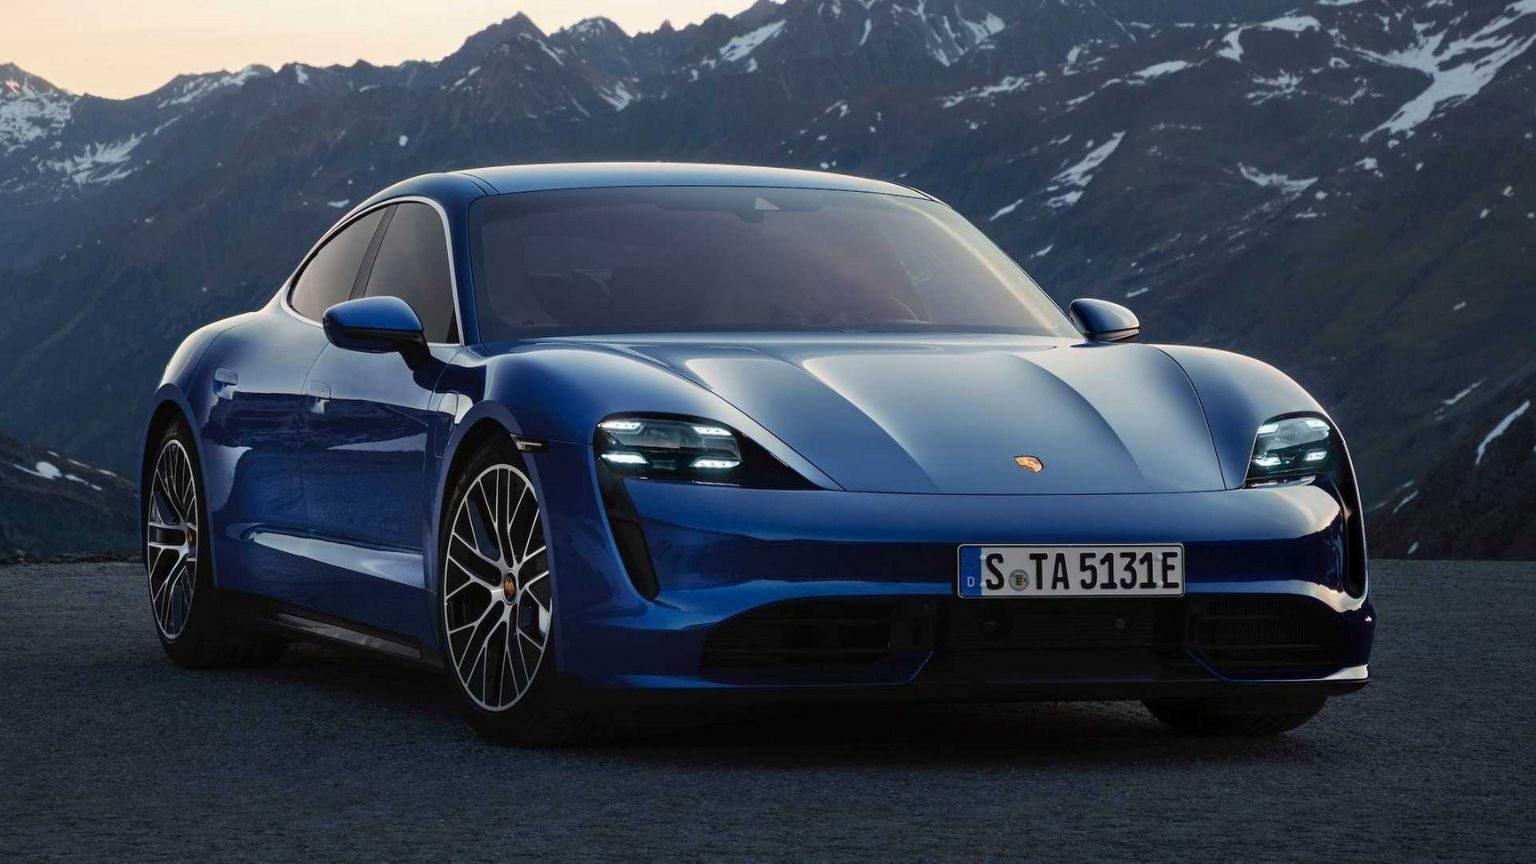 2020 Porsche Taycan car